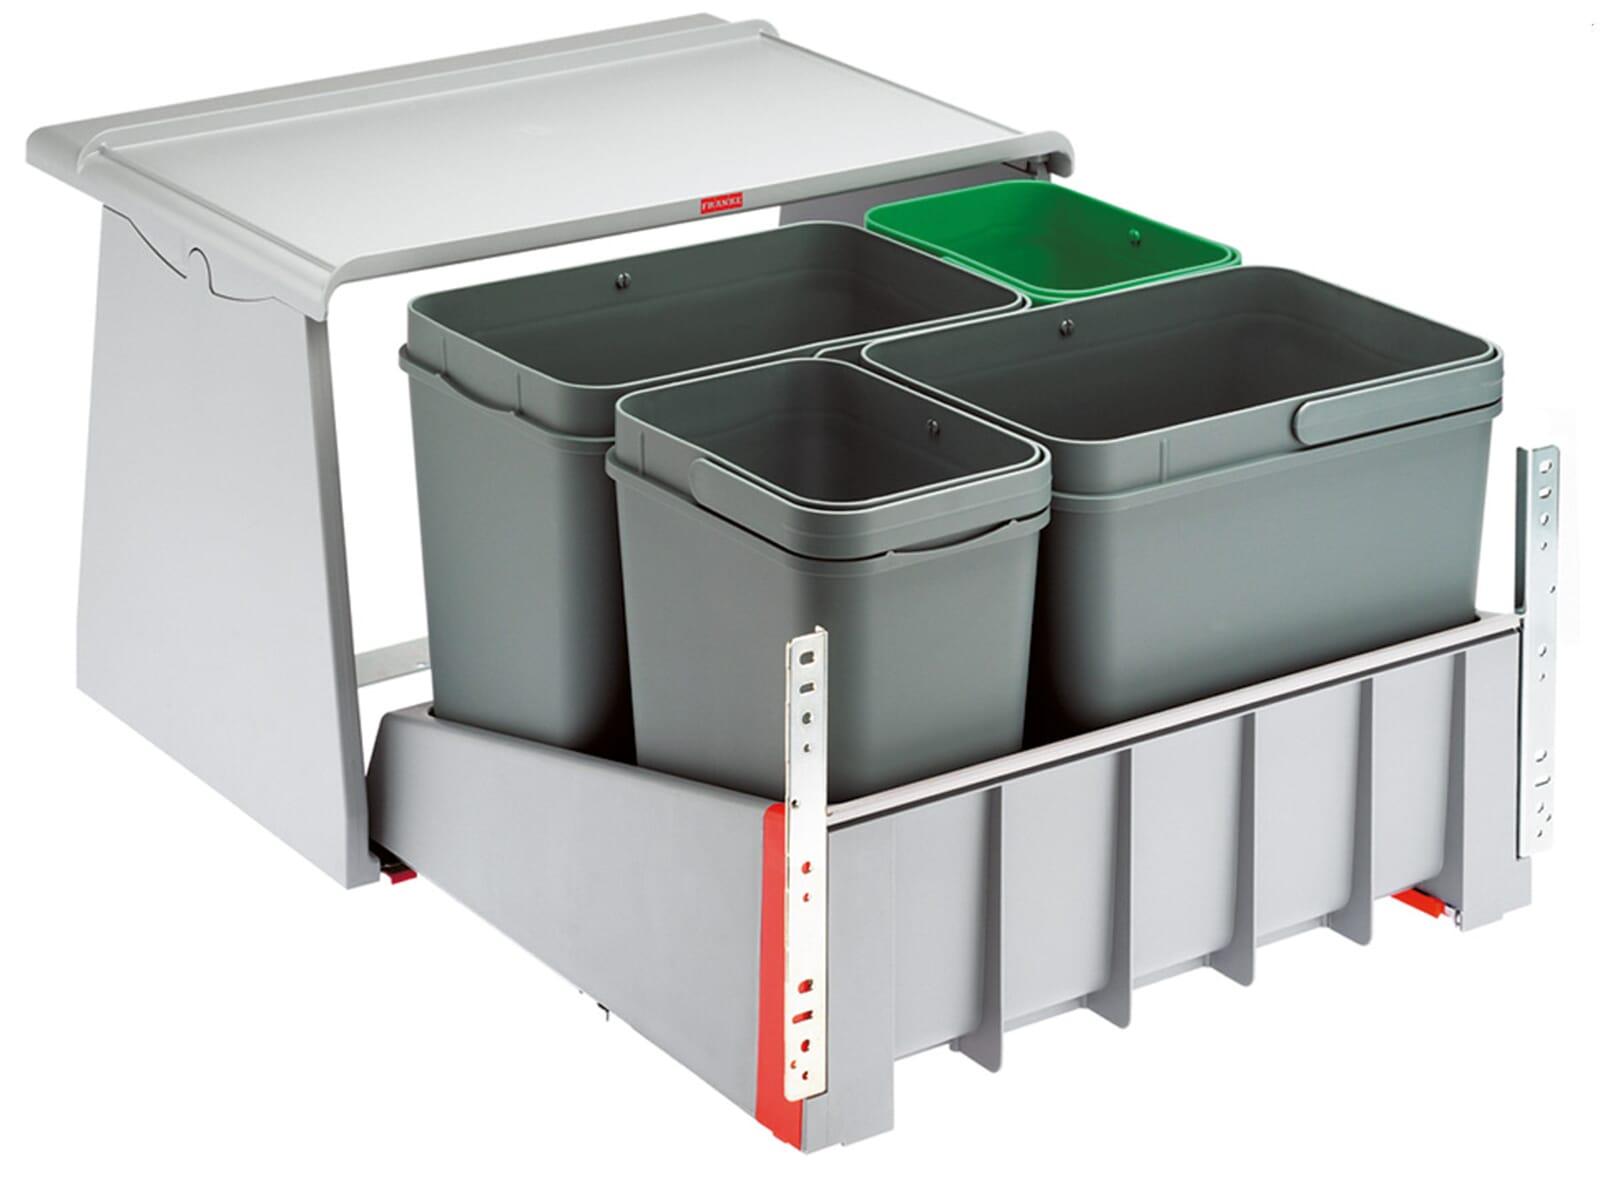 Produktabbildung Franke Sorter 700-60 KickMatic - 121.0173.362 Einbau Abfallsammler